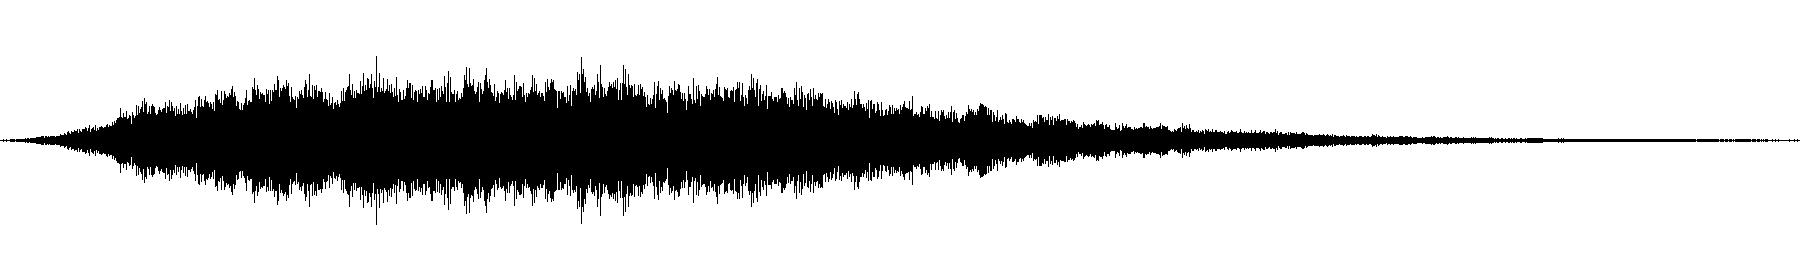 synth choir a6